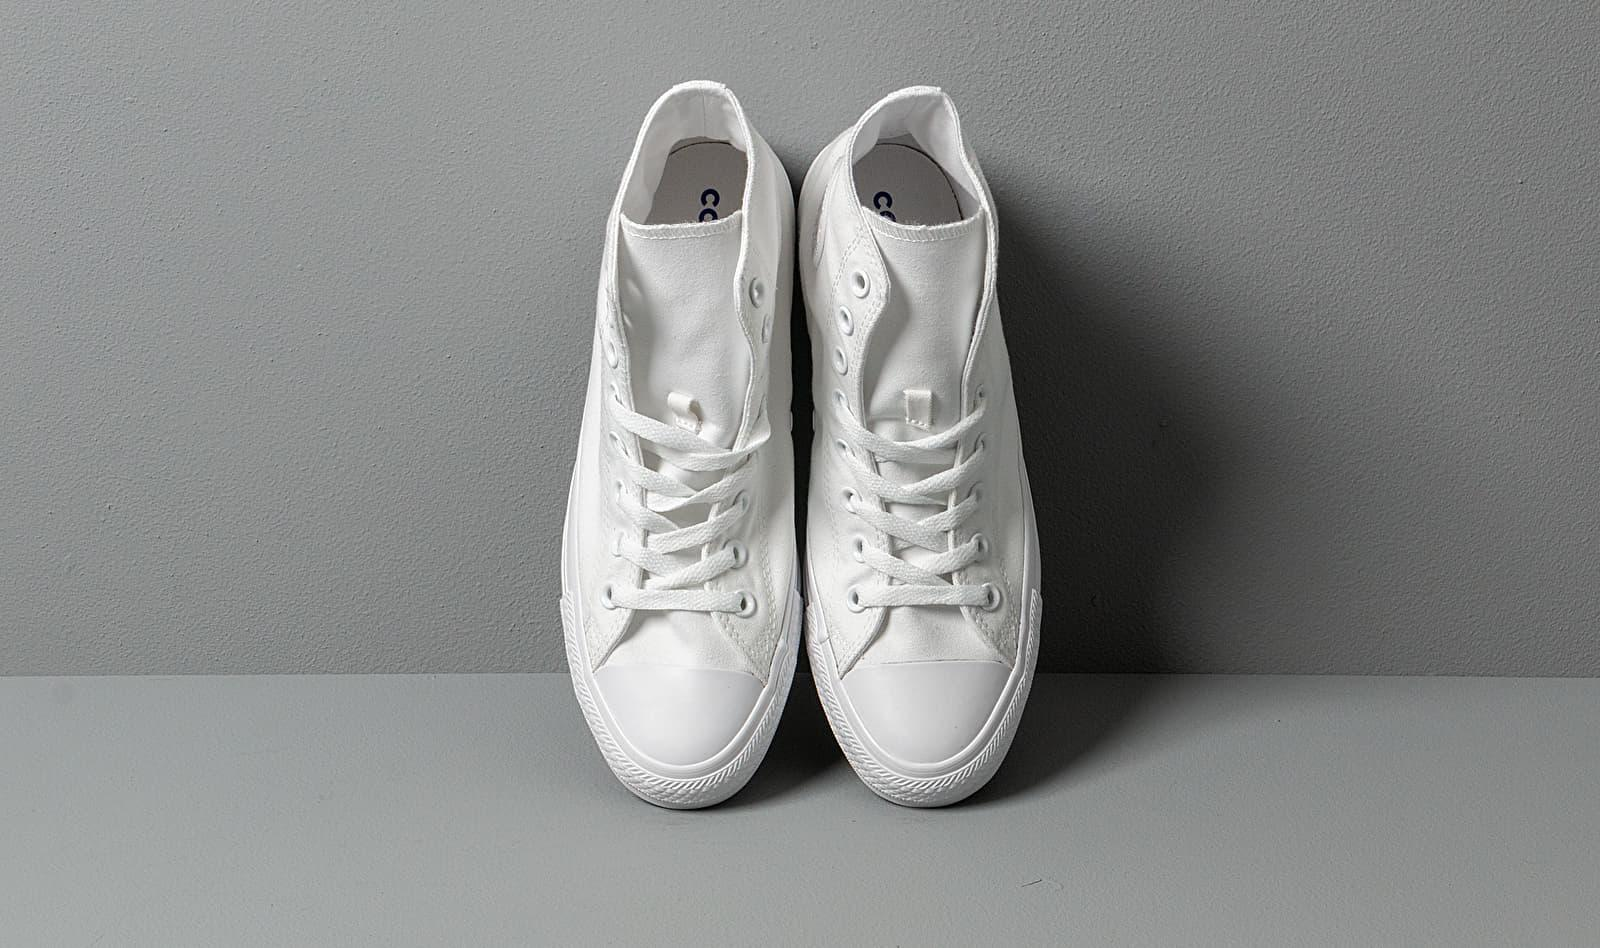 CT As Sp Hi White/White Converse